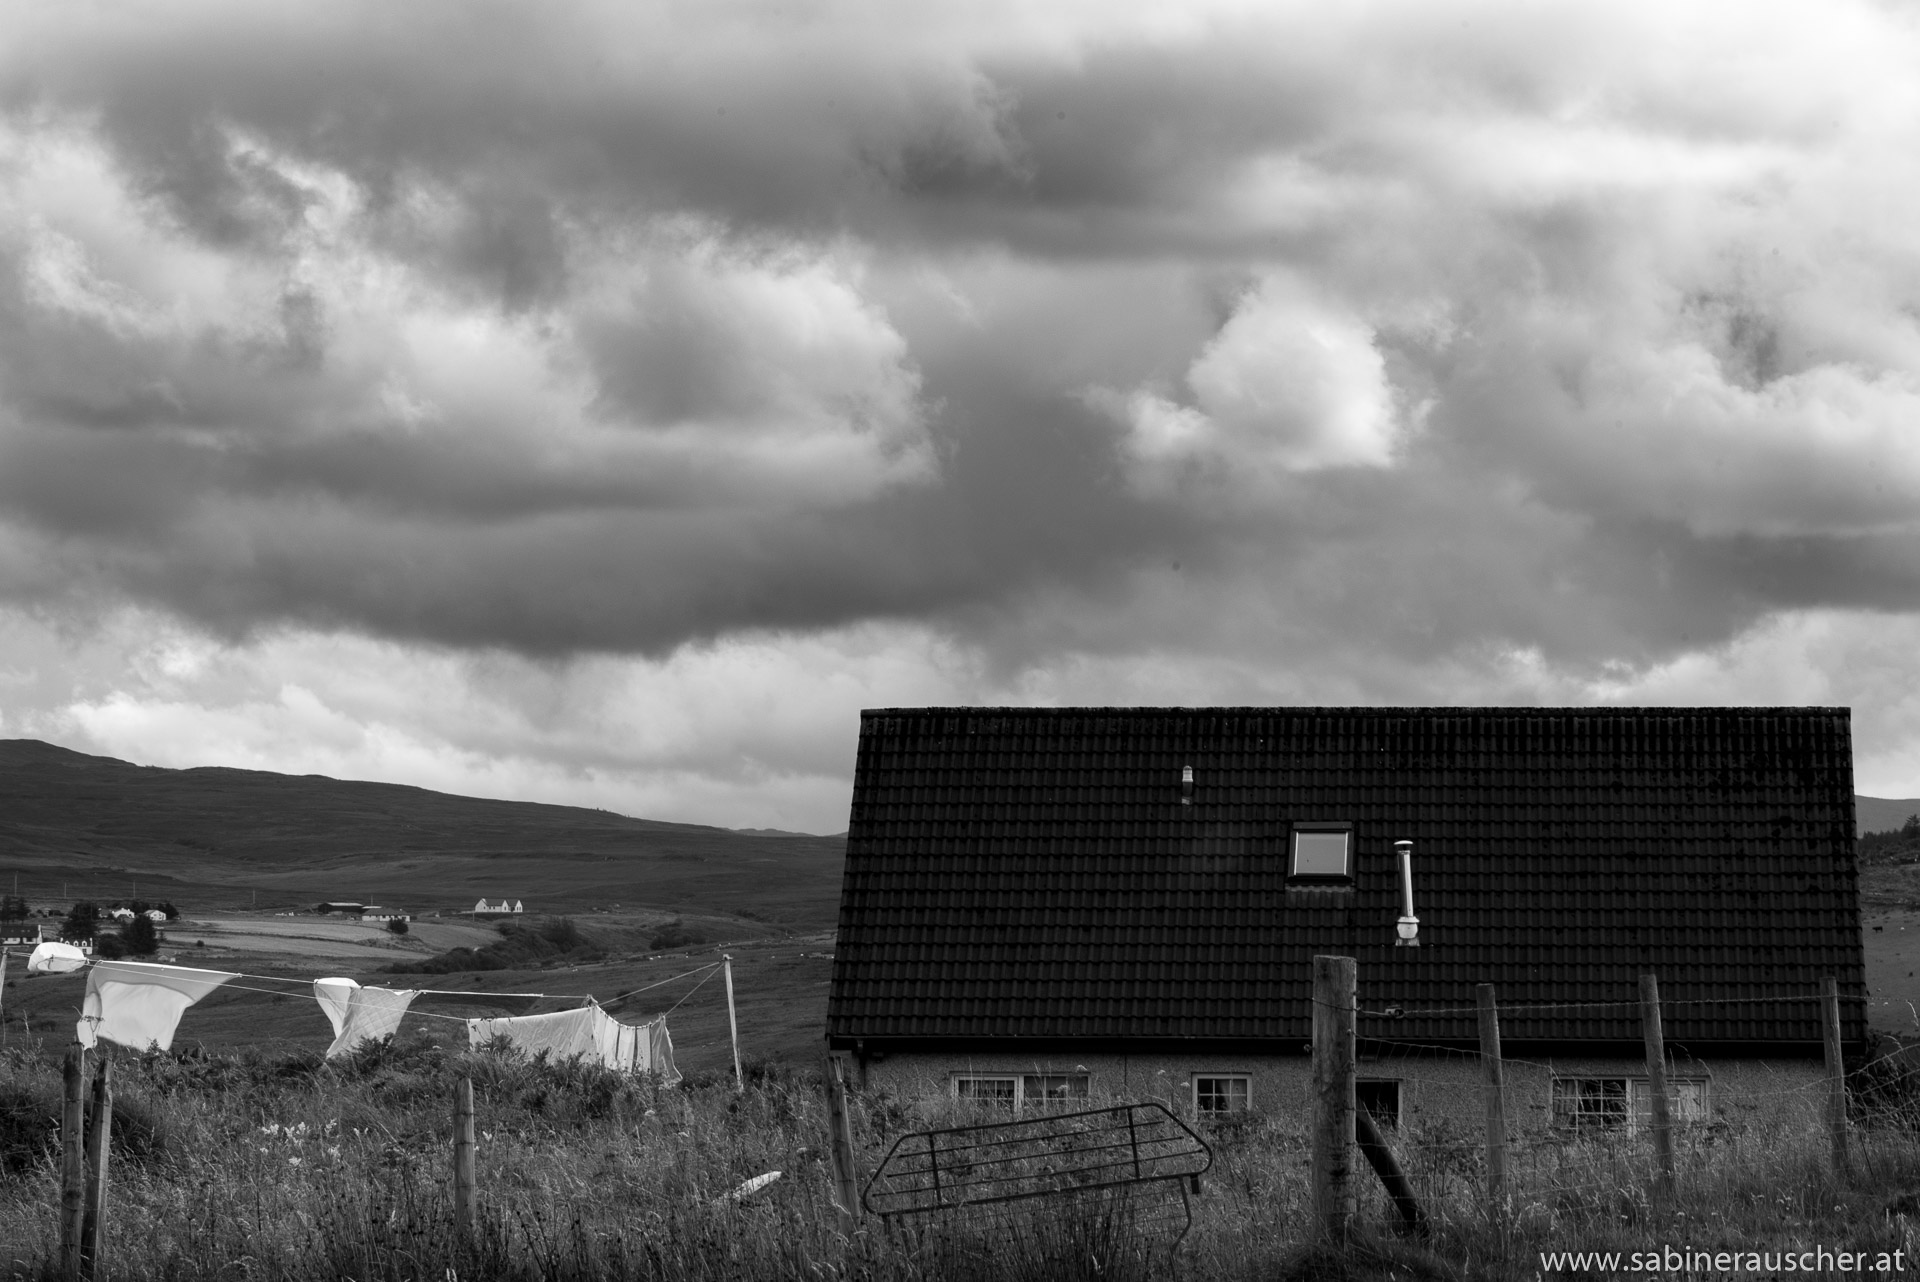 Impression of Isle of Skye | Impression auf der Isle of Skye